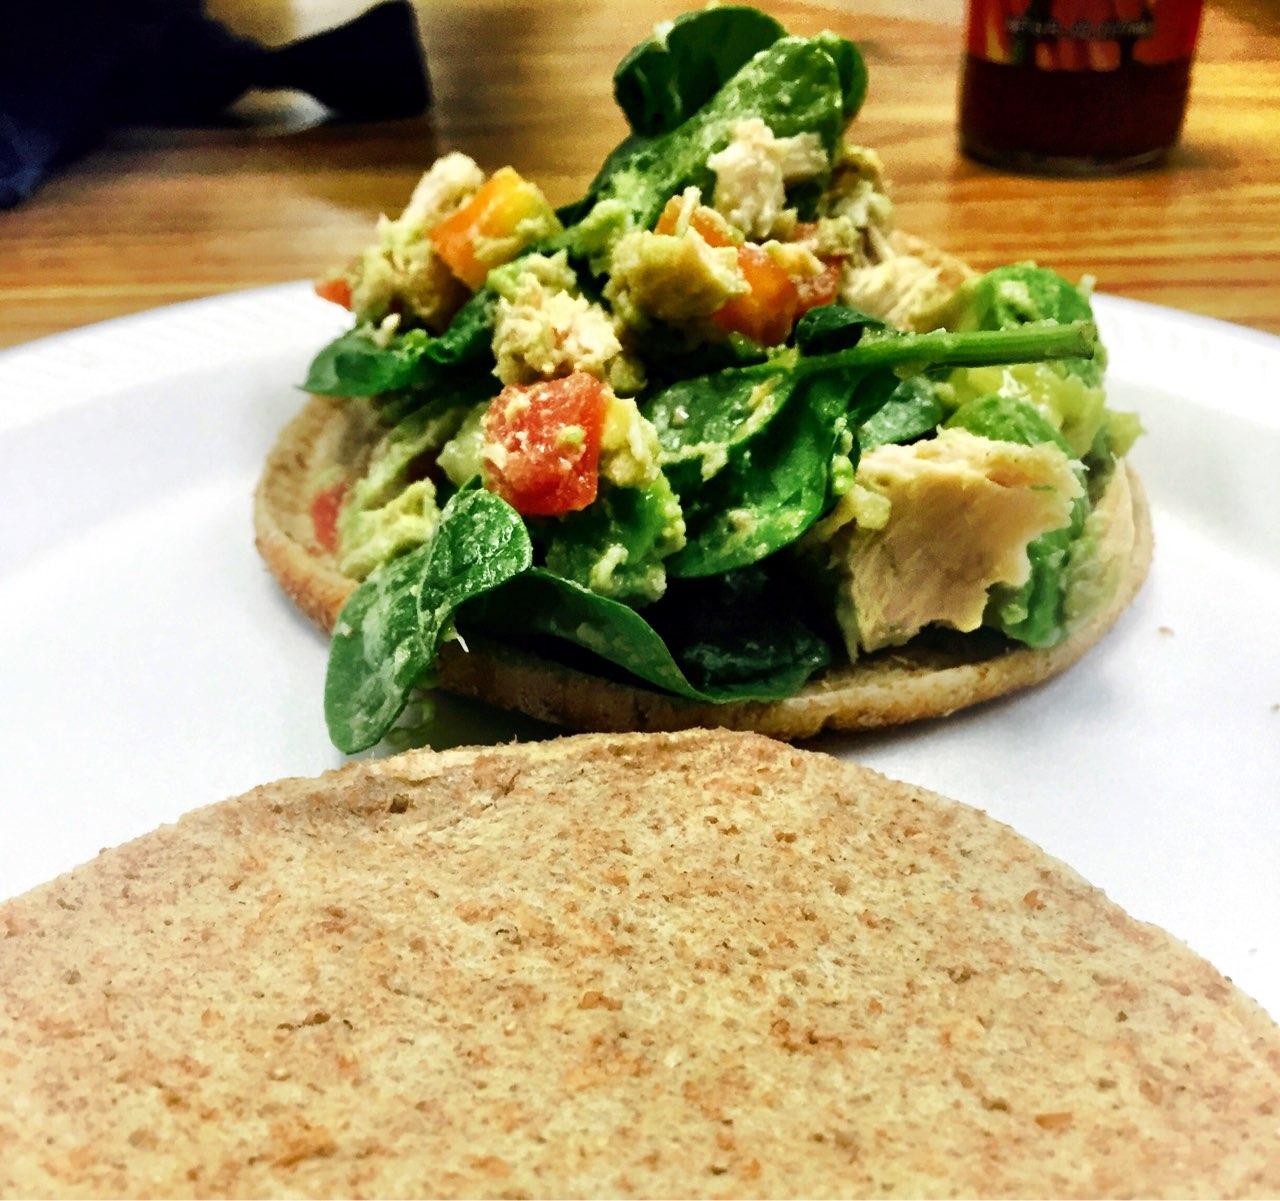 Nutritionist nate 39 s avocado tuna salad sandwich for Tuna fish salad calories